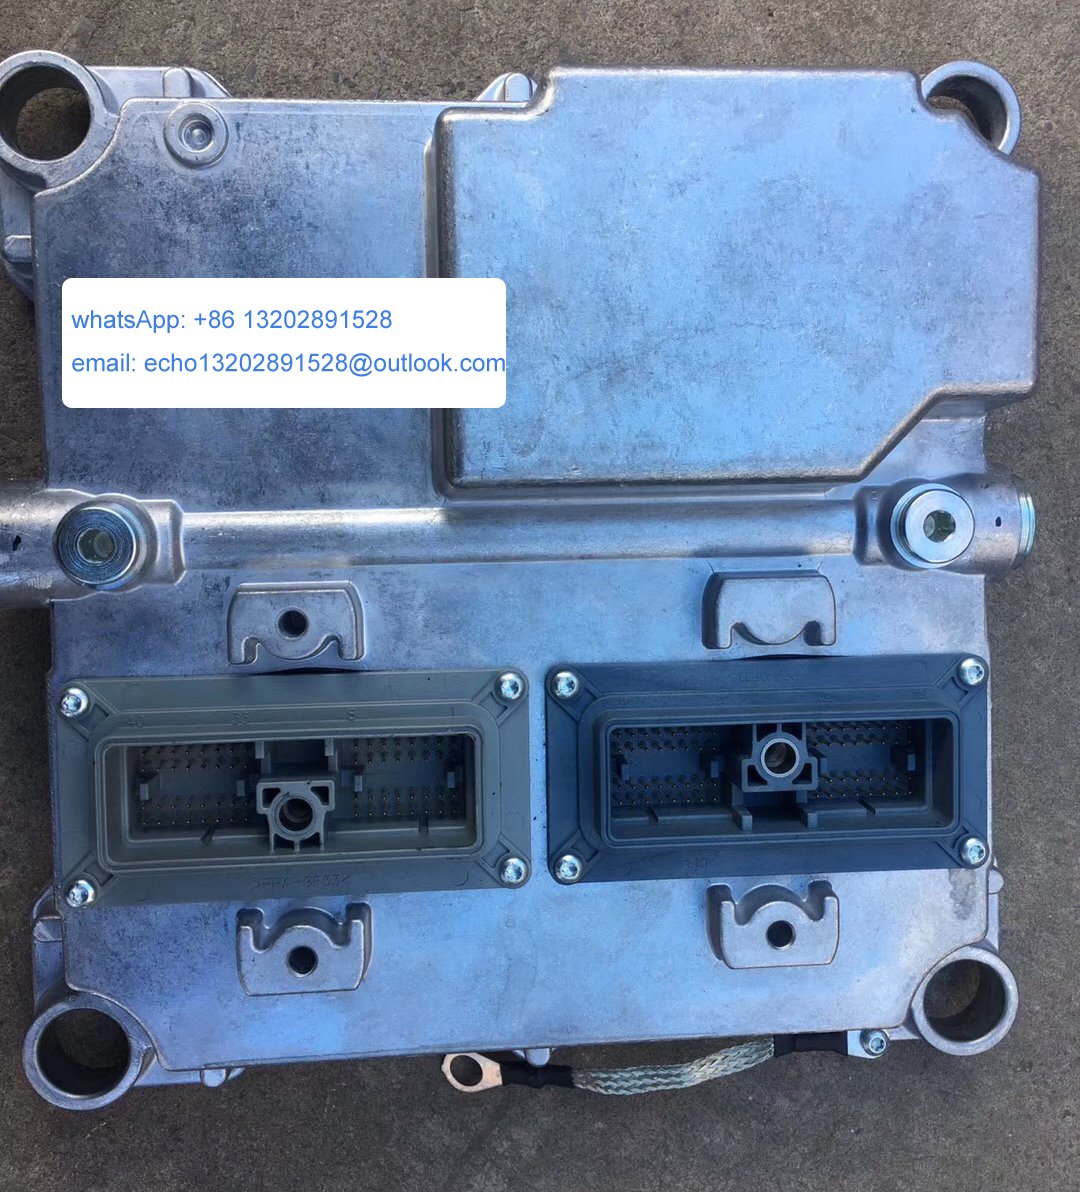 28170119 ECM(engine control module),Perkins spare parts for 1106, Caterpillar C6.6,4.4 320D